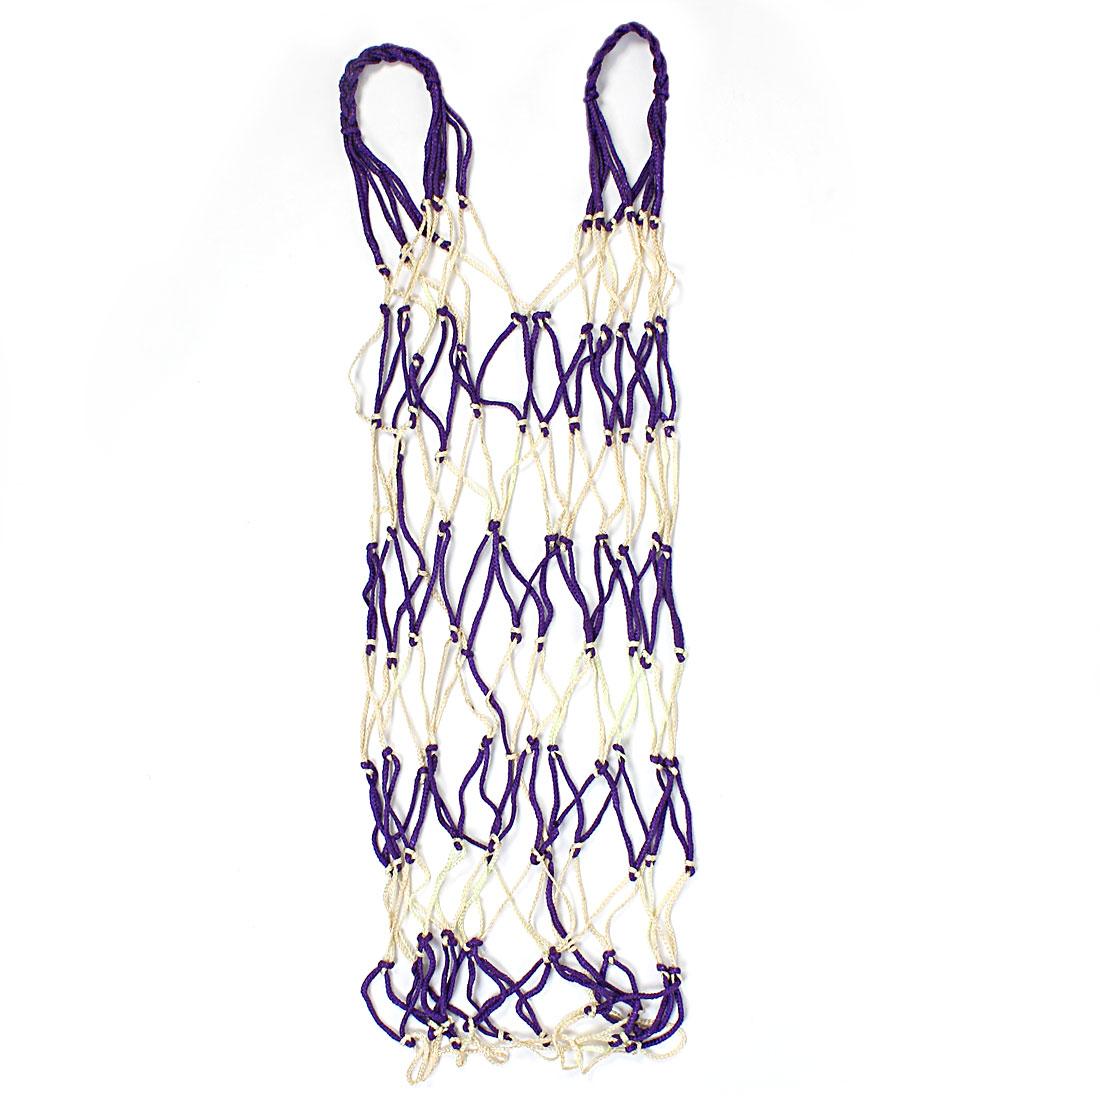 Nylon Knot Net Bag Ball Carry Mesh Basketball Football Soccer Holder Yellow Purple Red